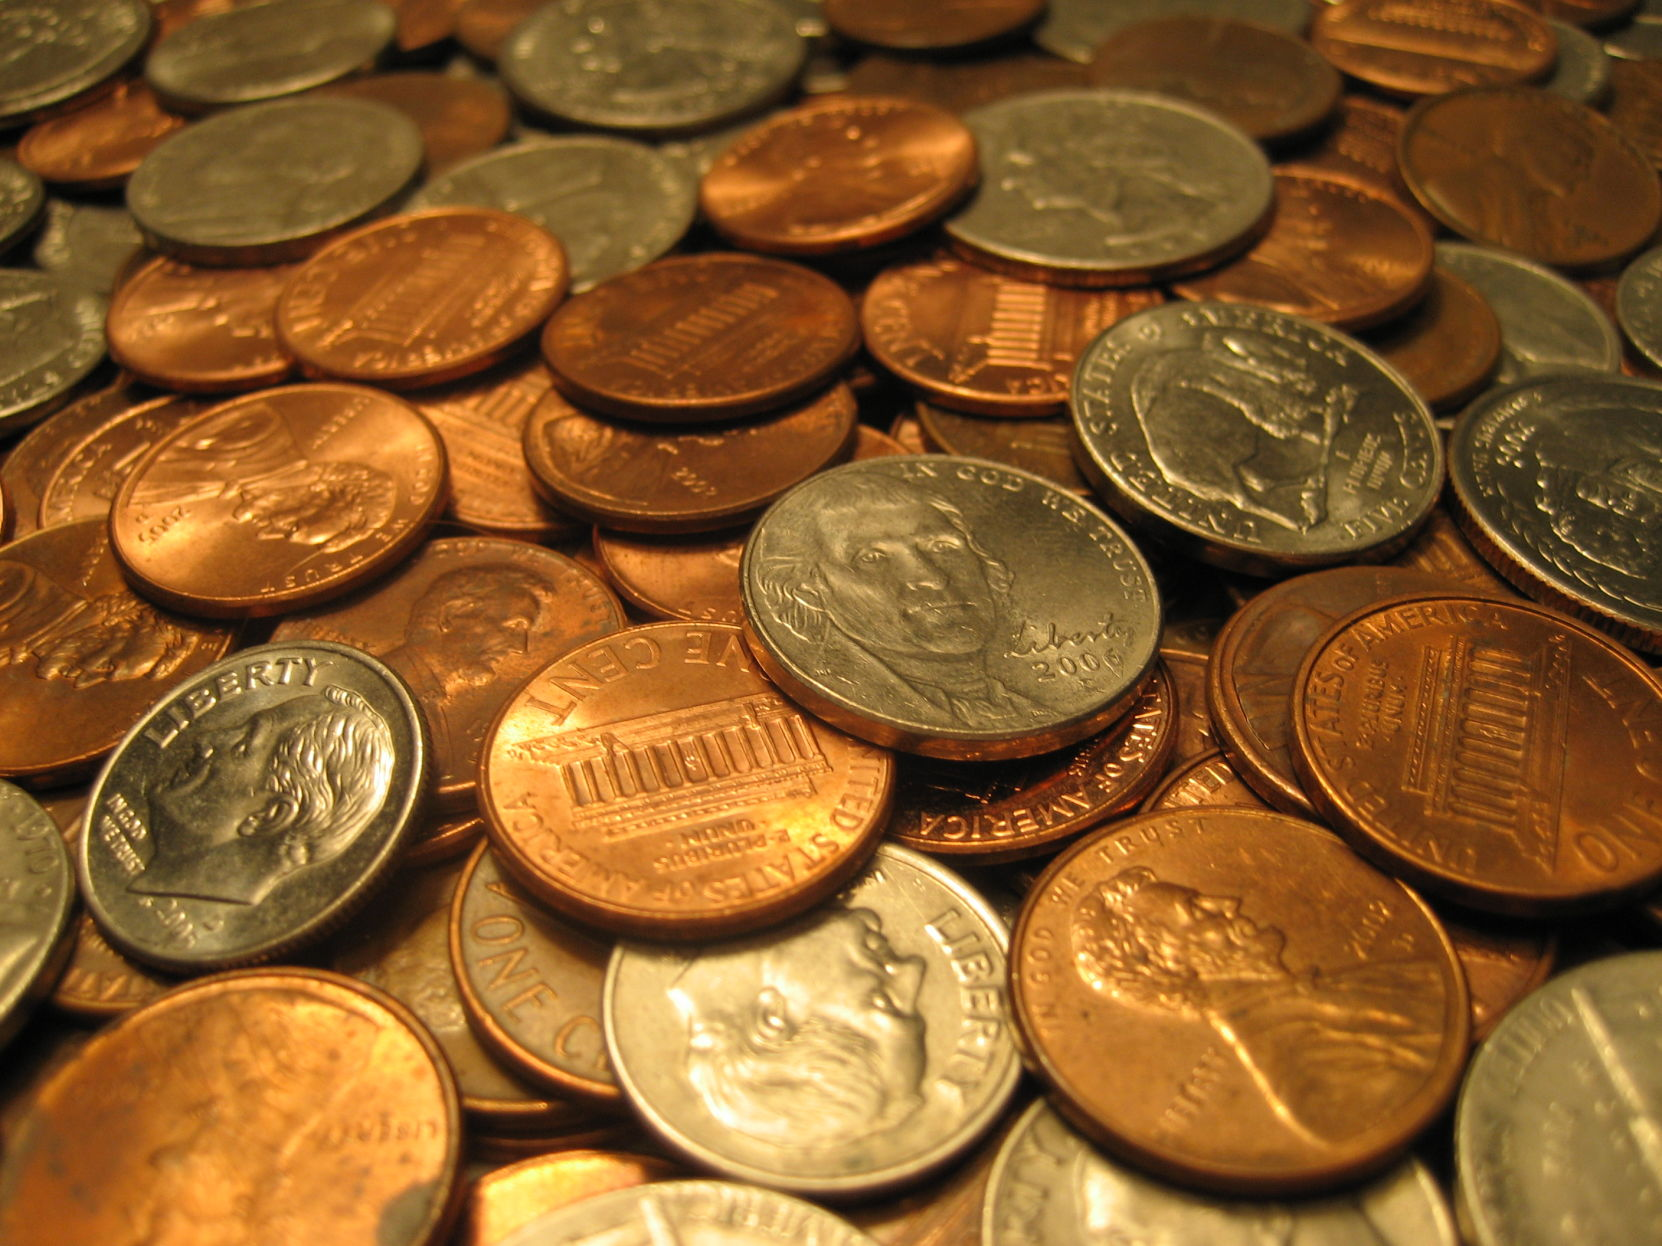 Legal tender: City resident says treasurer broke law by refusing ...